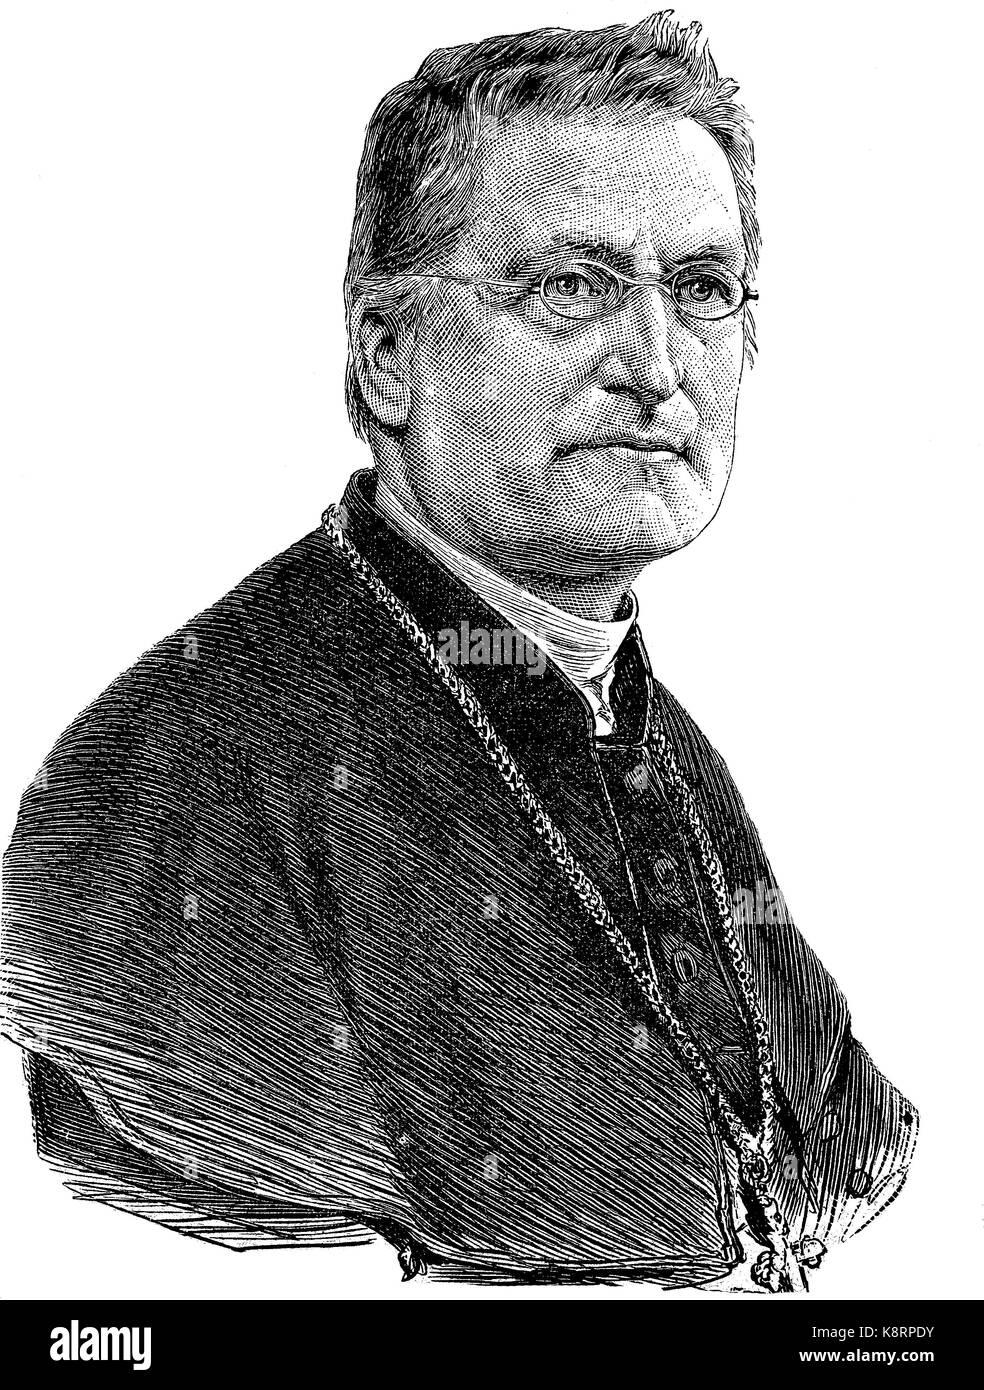 Johannes Christian Roos, 1826 - 1896, a German Roman Catholic clergyman. He was Bishop of Limburg, Germany, digital Stock Photo